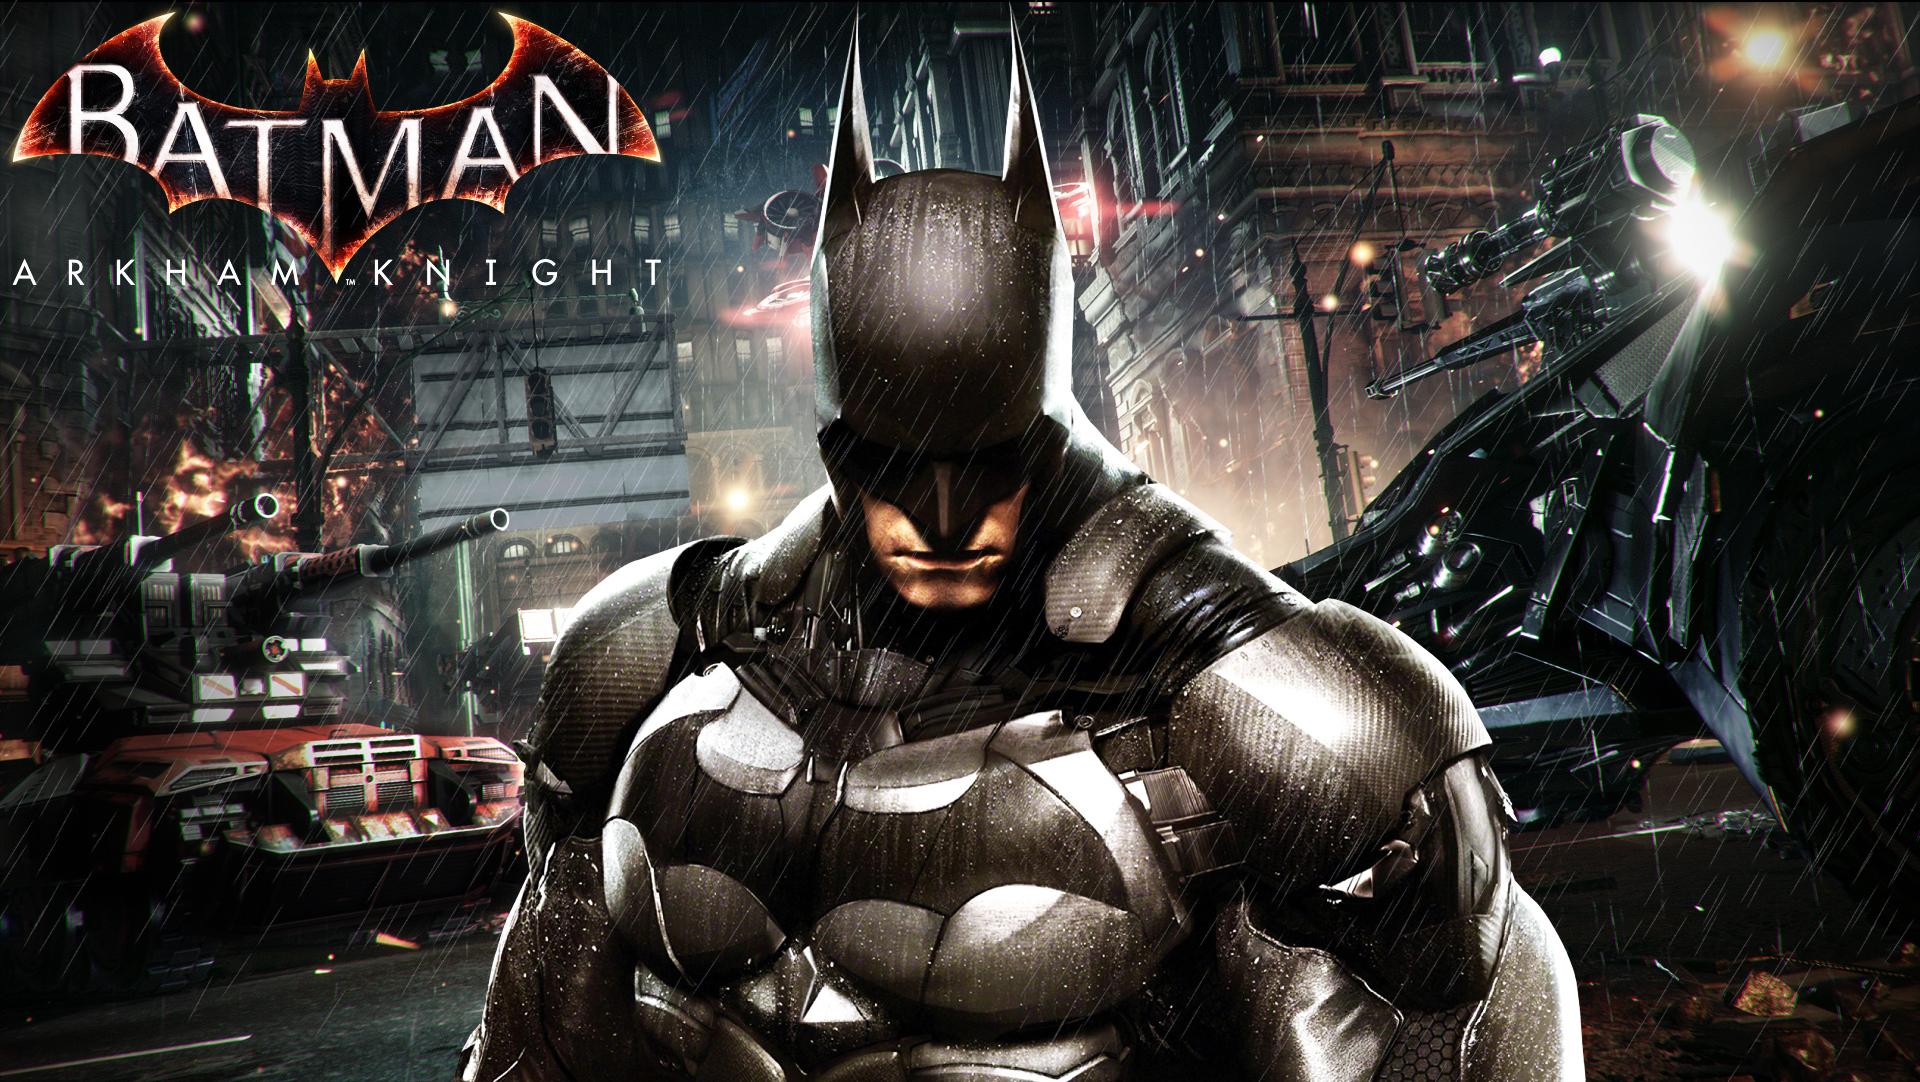 GamerZone Batman Arkham Knight PS4 XB1 PC REVIEW